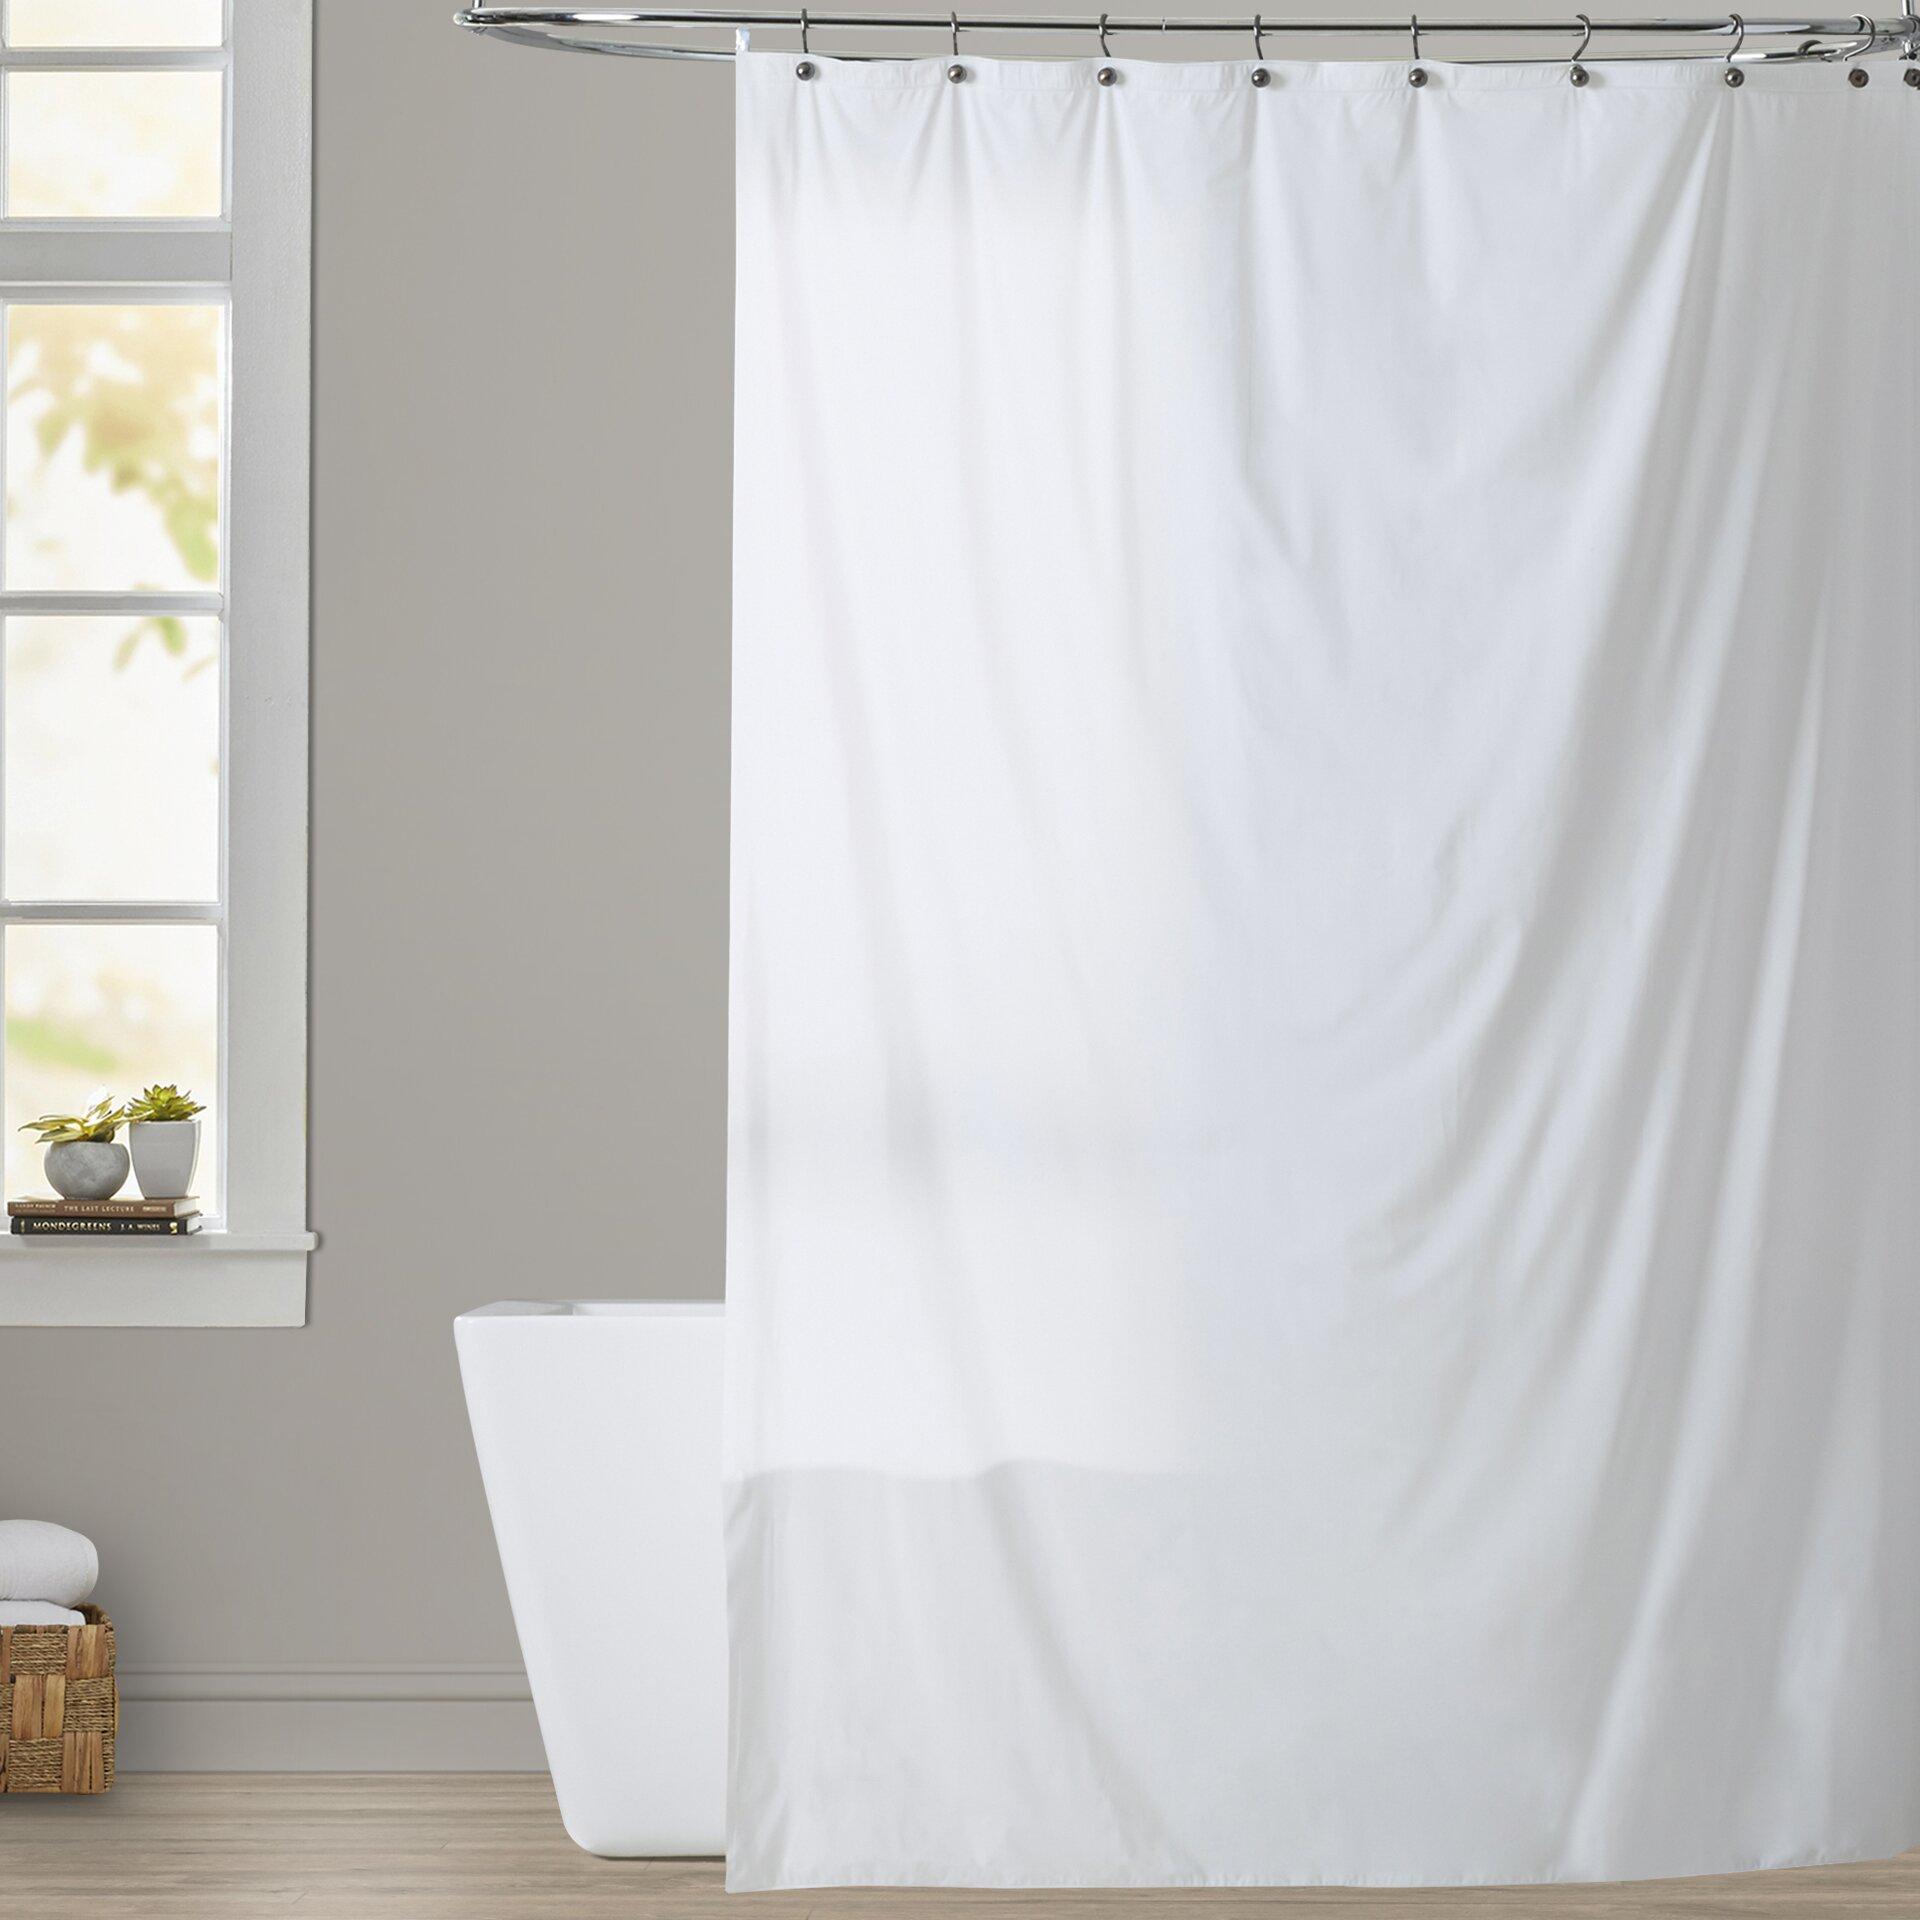 Symple Stuff Vinyl Shower Curtain Liner Amp Reviews Wayfair